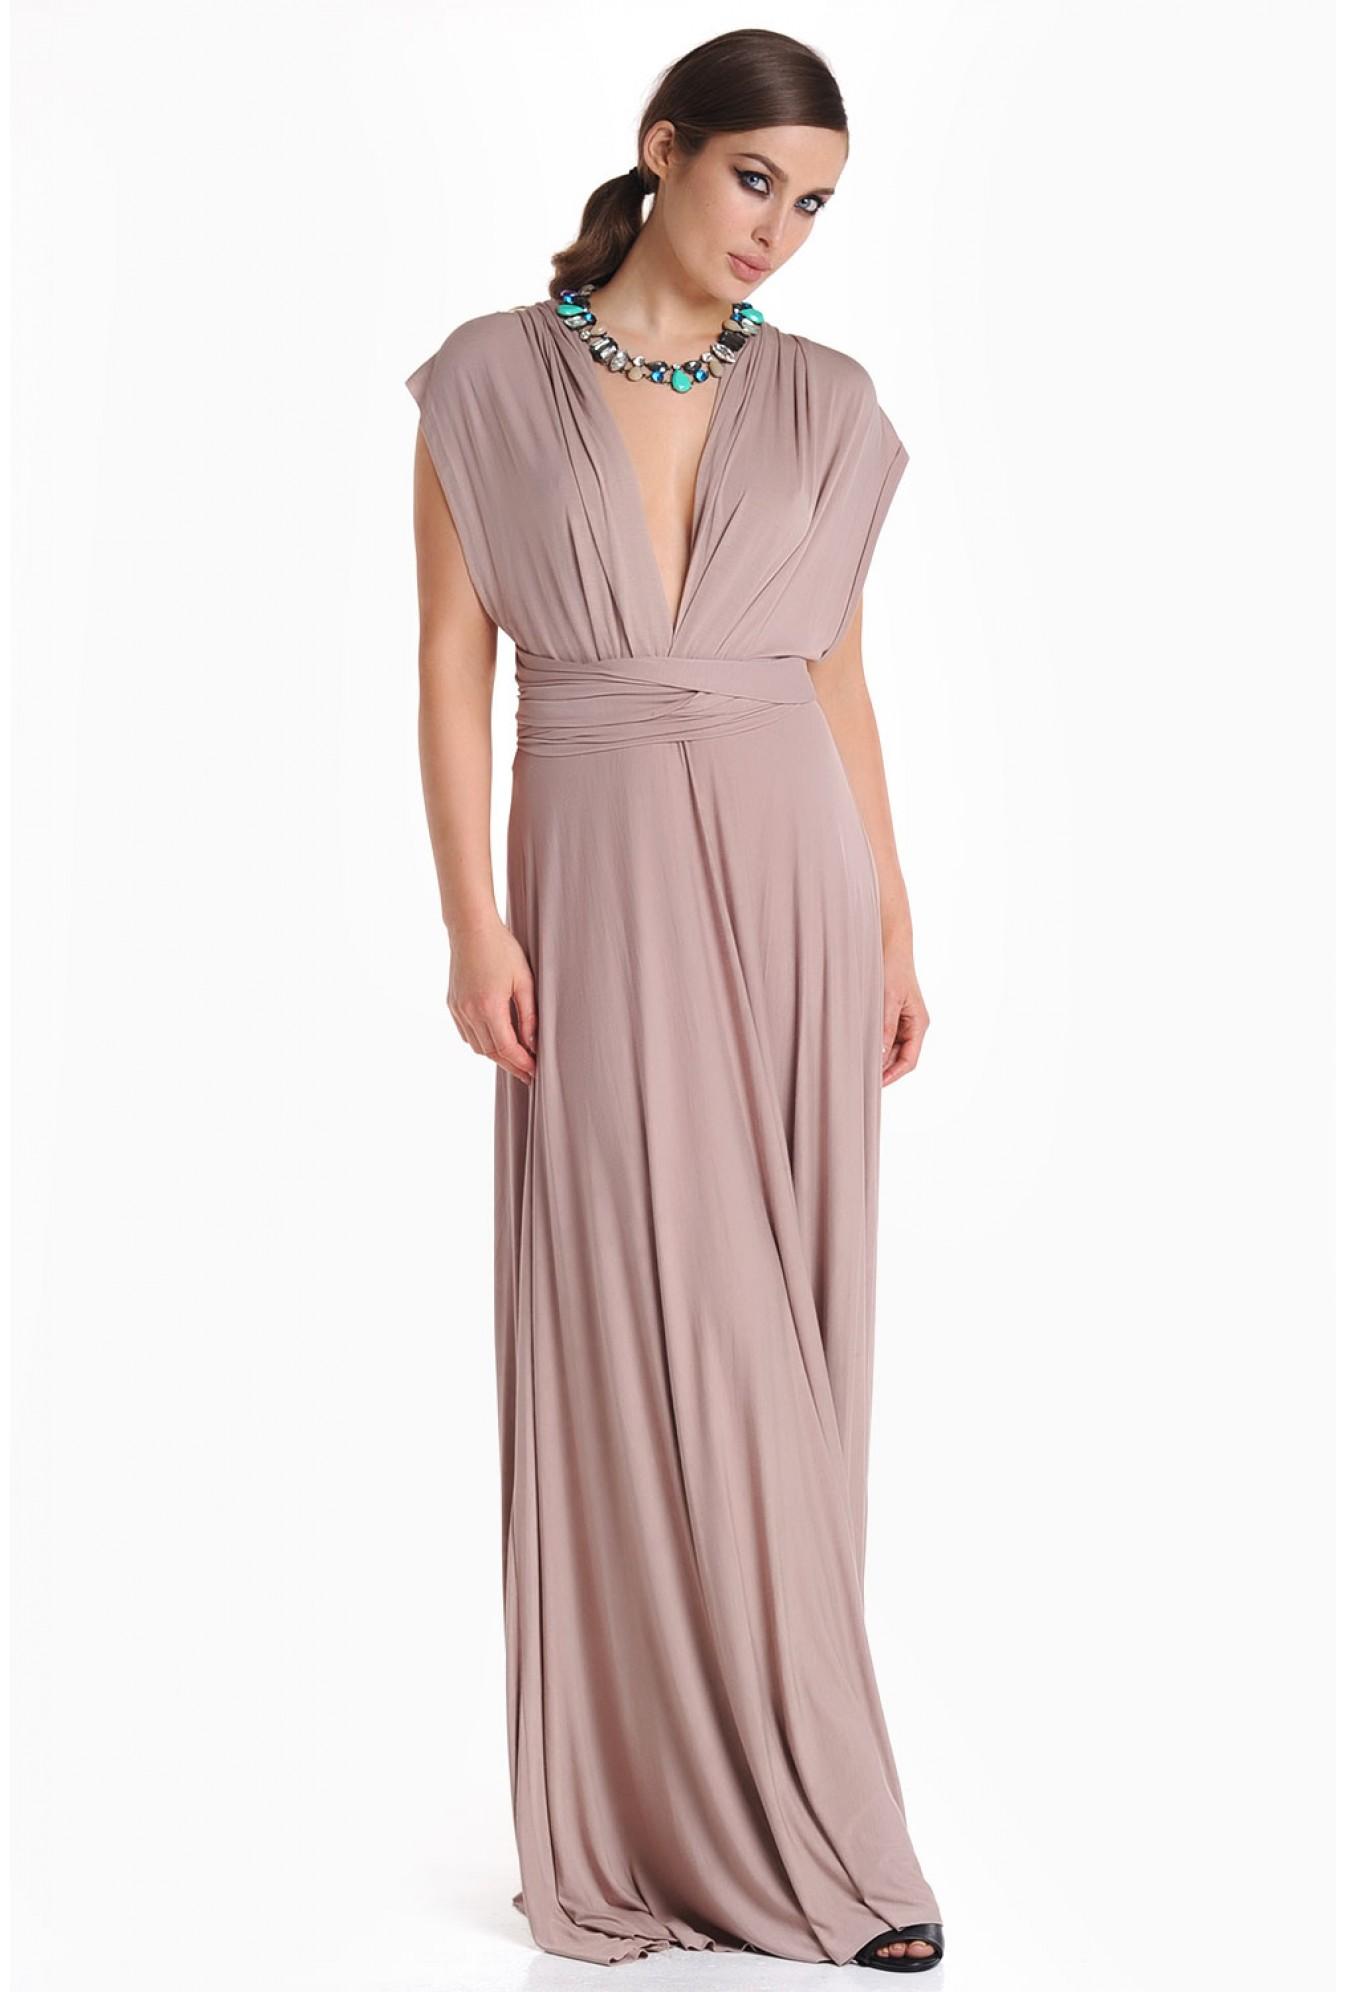 7366f47a38553 iCLOTHING Blair Multi Way Maxi Dress in Mocha   iCLOTHING